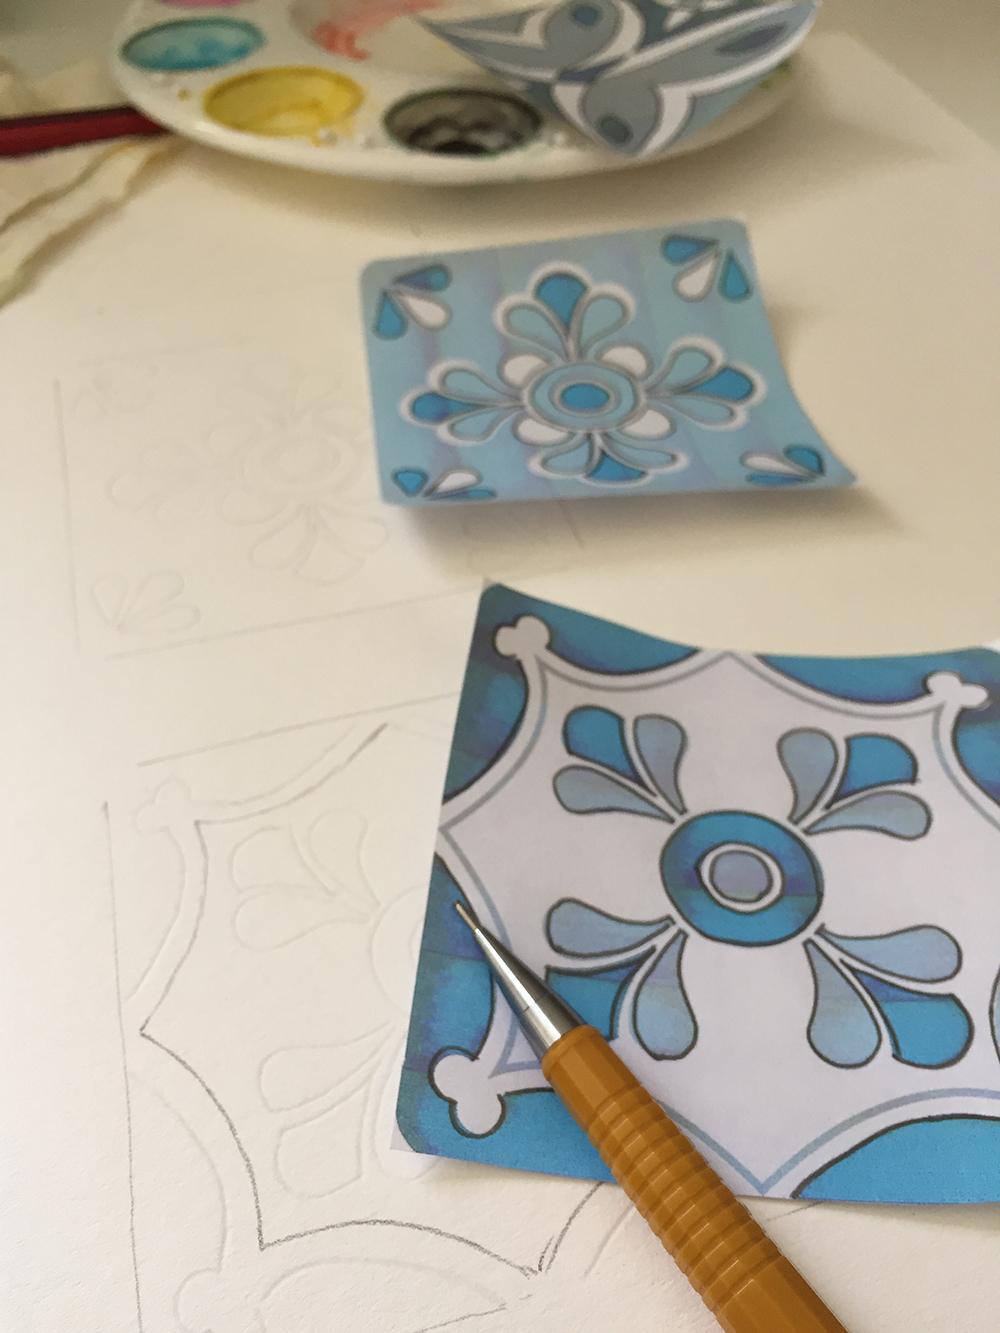 mexica-watercolor-tiles-pattern-10.JPG